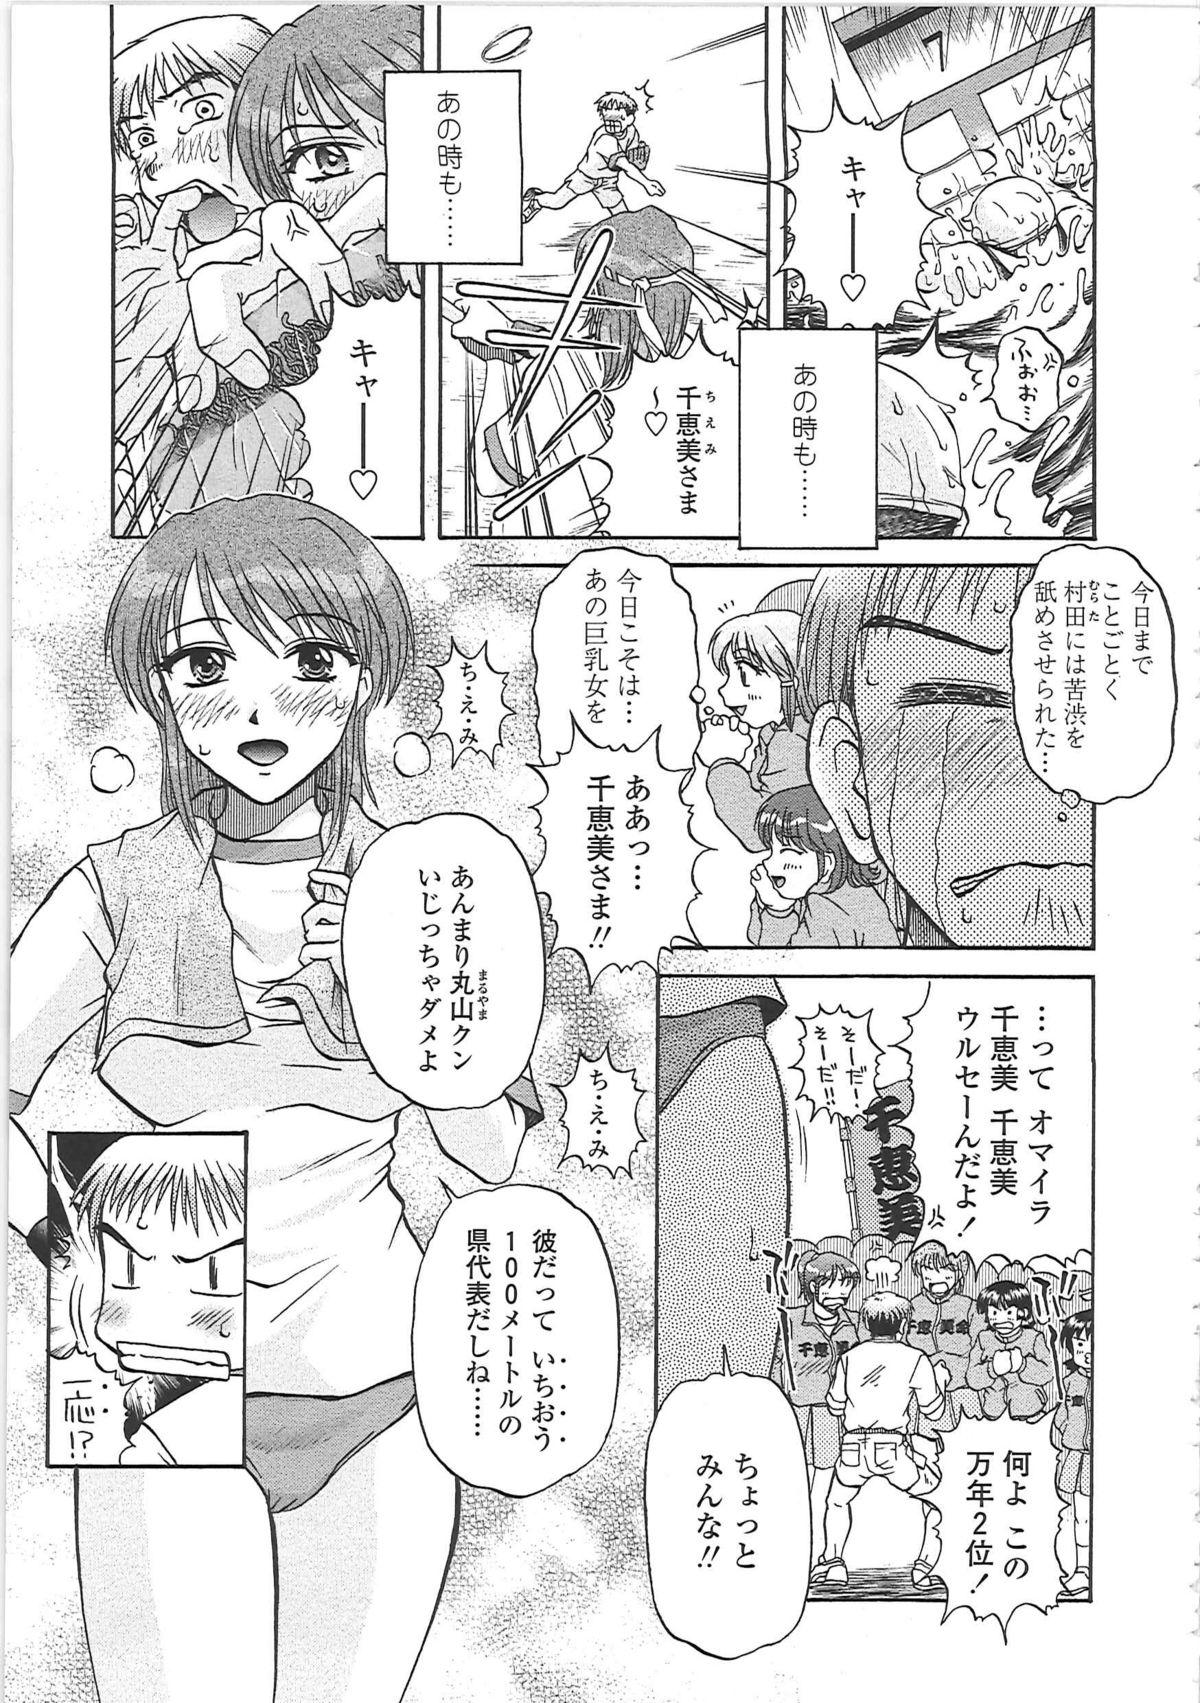 Nikuzuma Tsuushin - Erotic Wife Communication 163